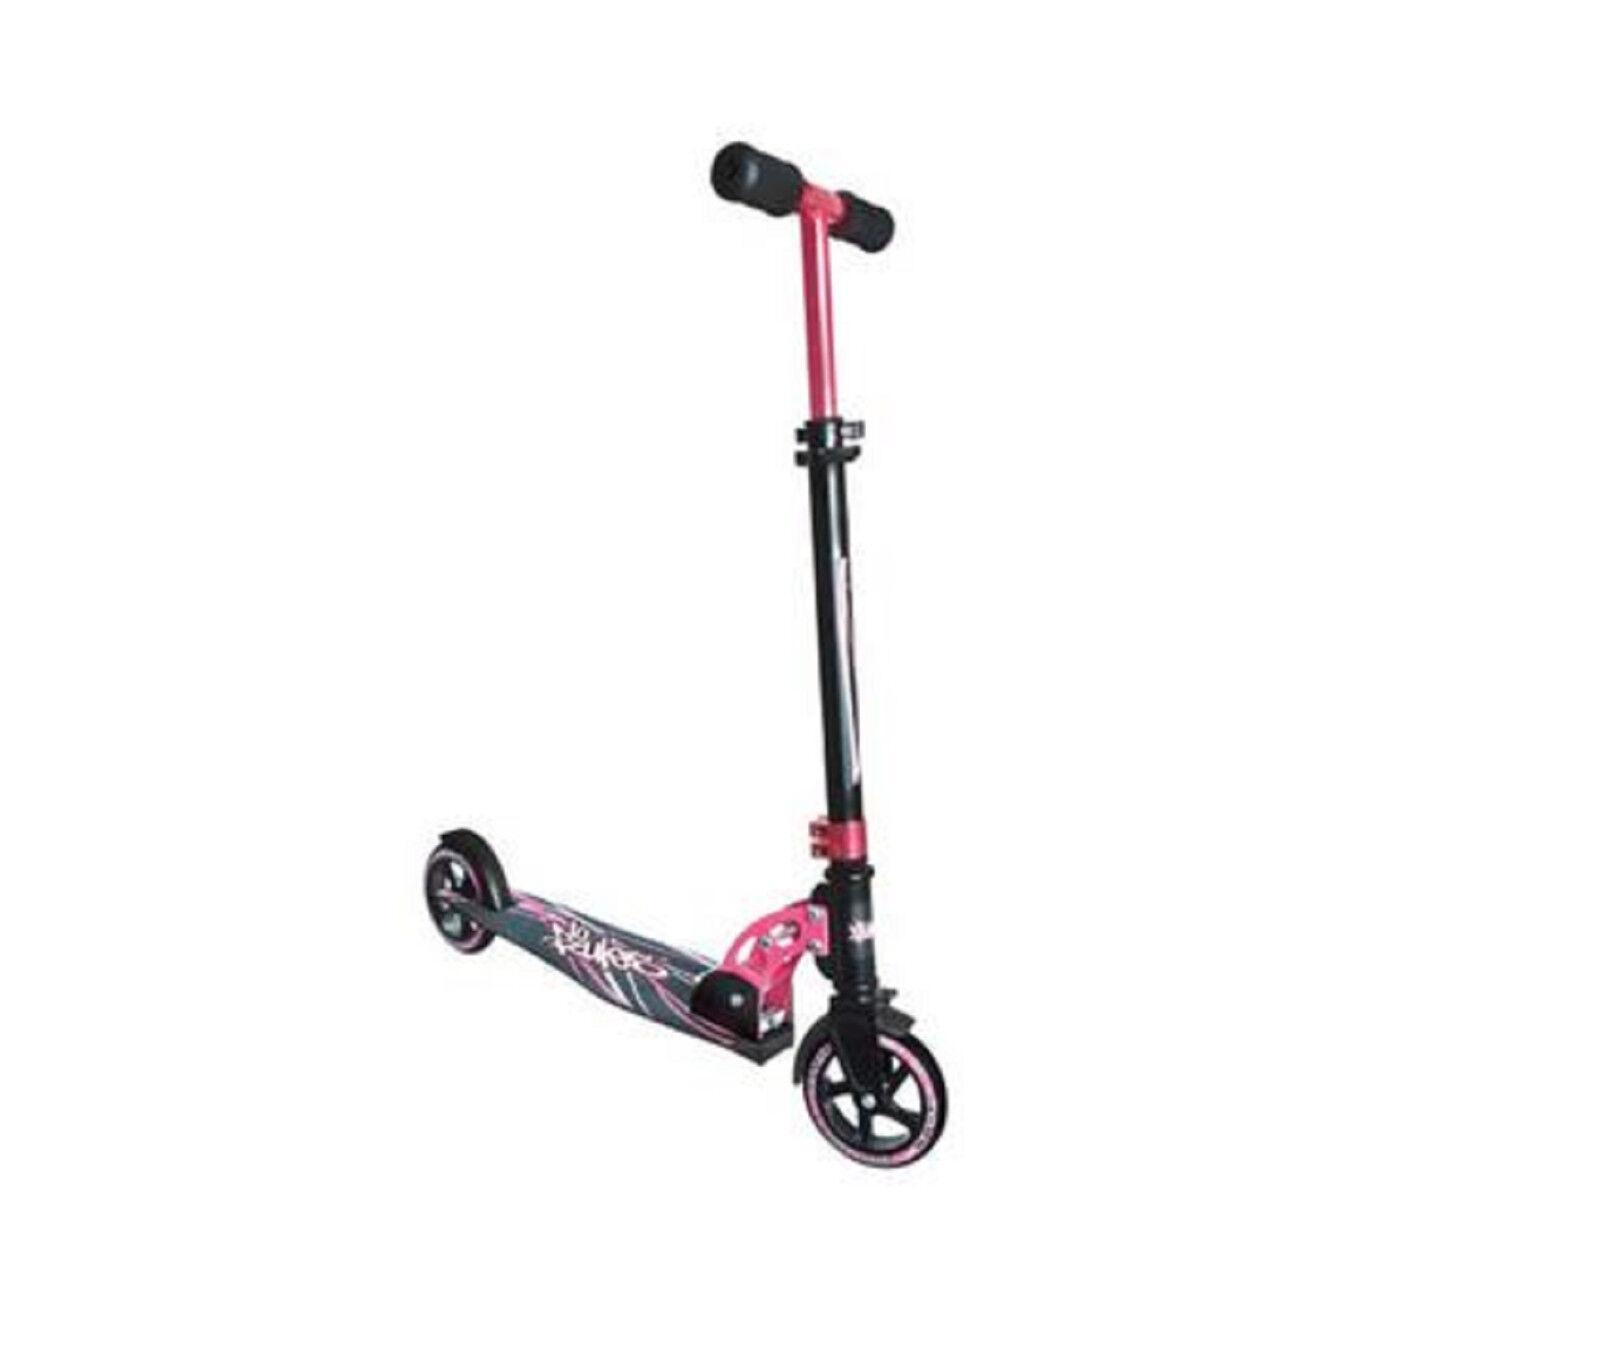 Authentic No Rules Rules No Aluminium Scooter 145 mm schwarz/Rosa Roller Cityroller NEU 30e30c